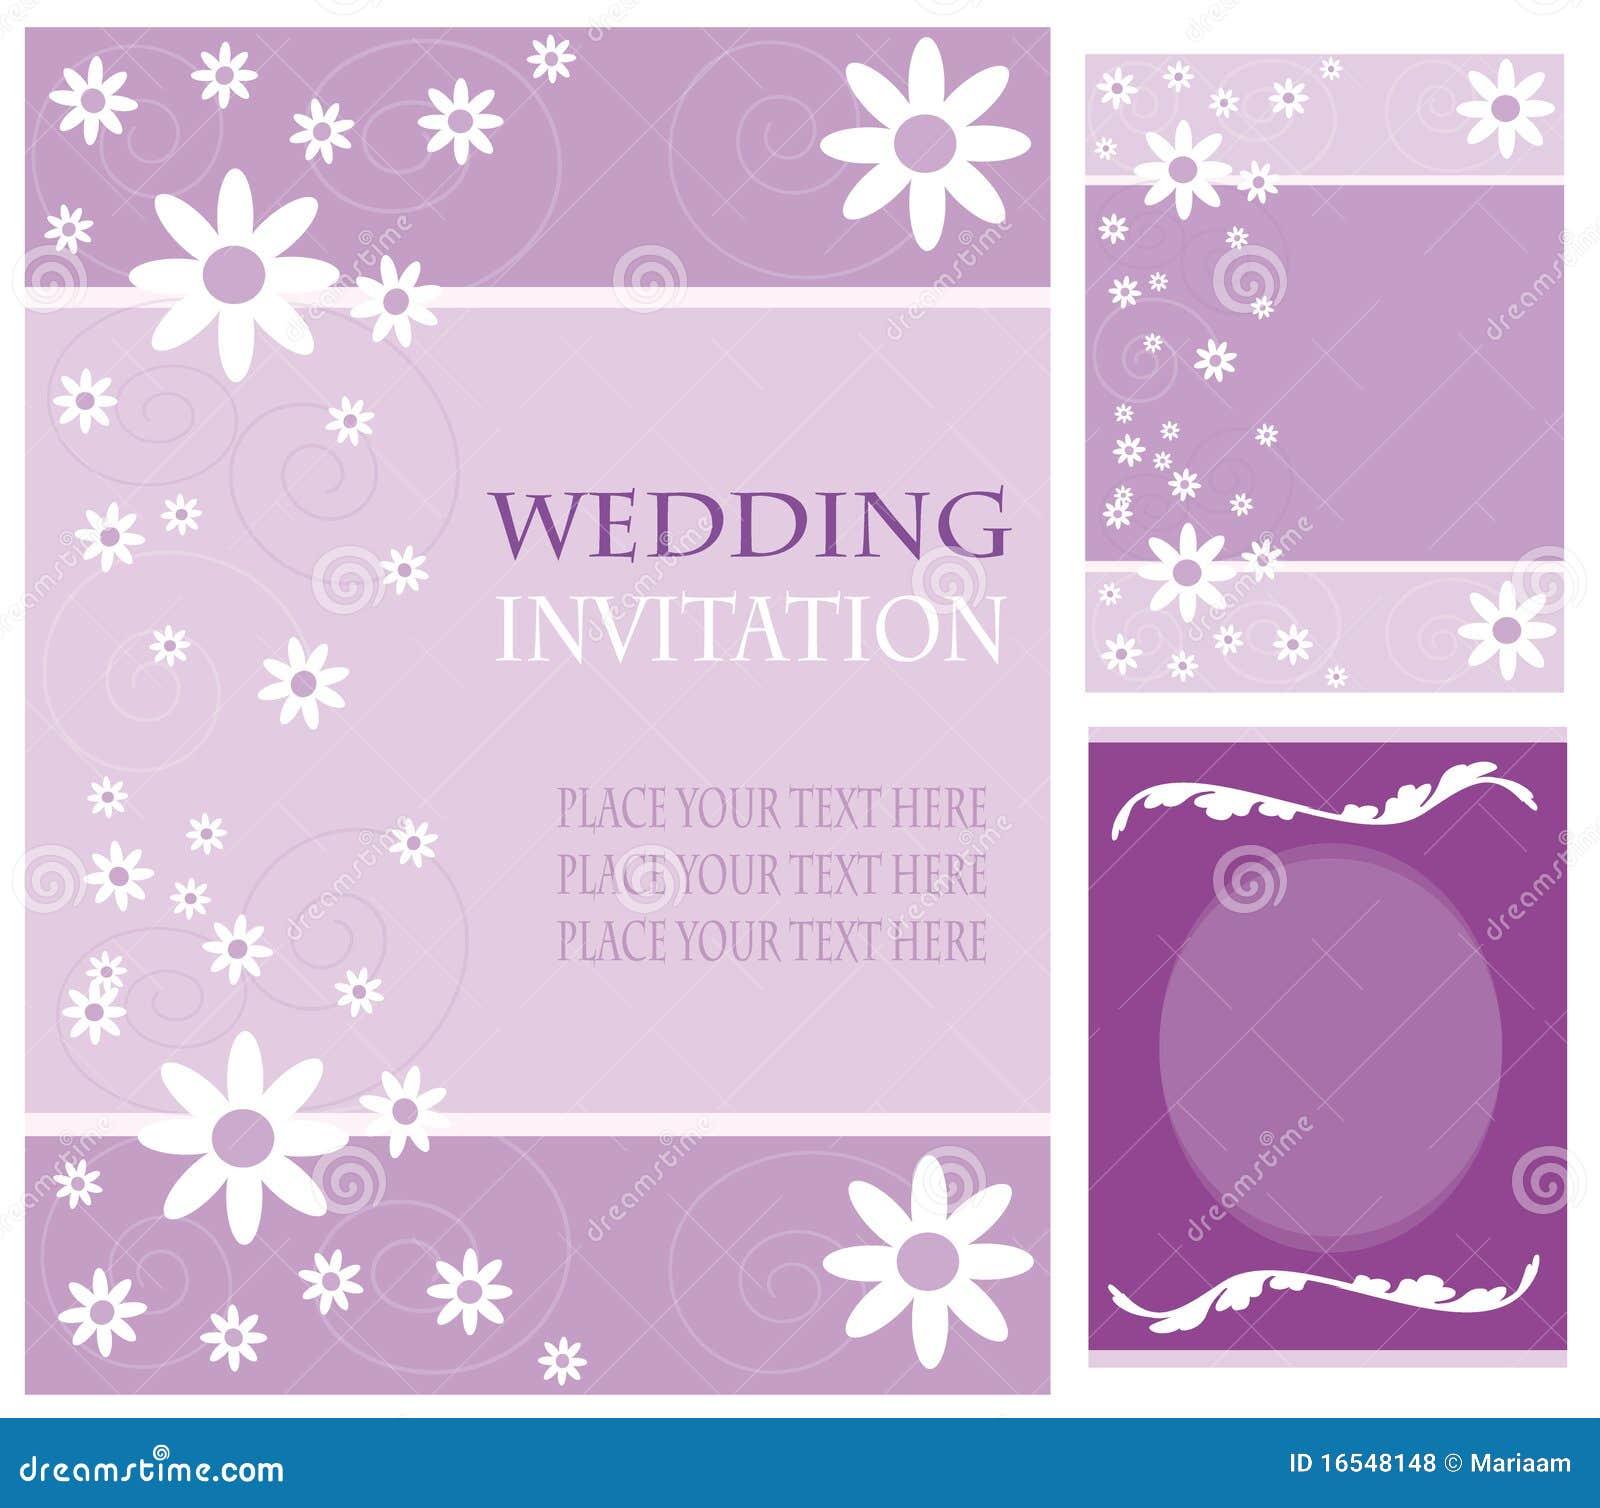 cartes d 39 invitation de mariage photos libres de droits image 16548148. Black Bedroom Furniture Sets. Home Design Ideas